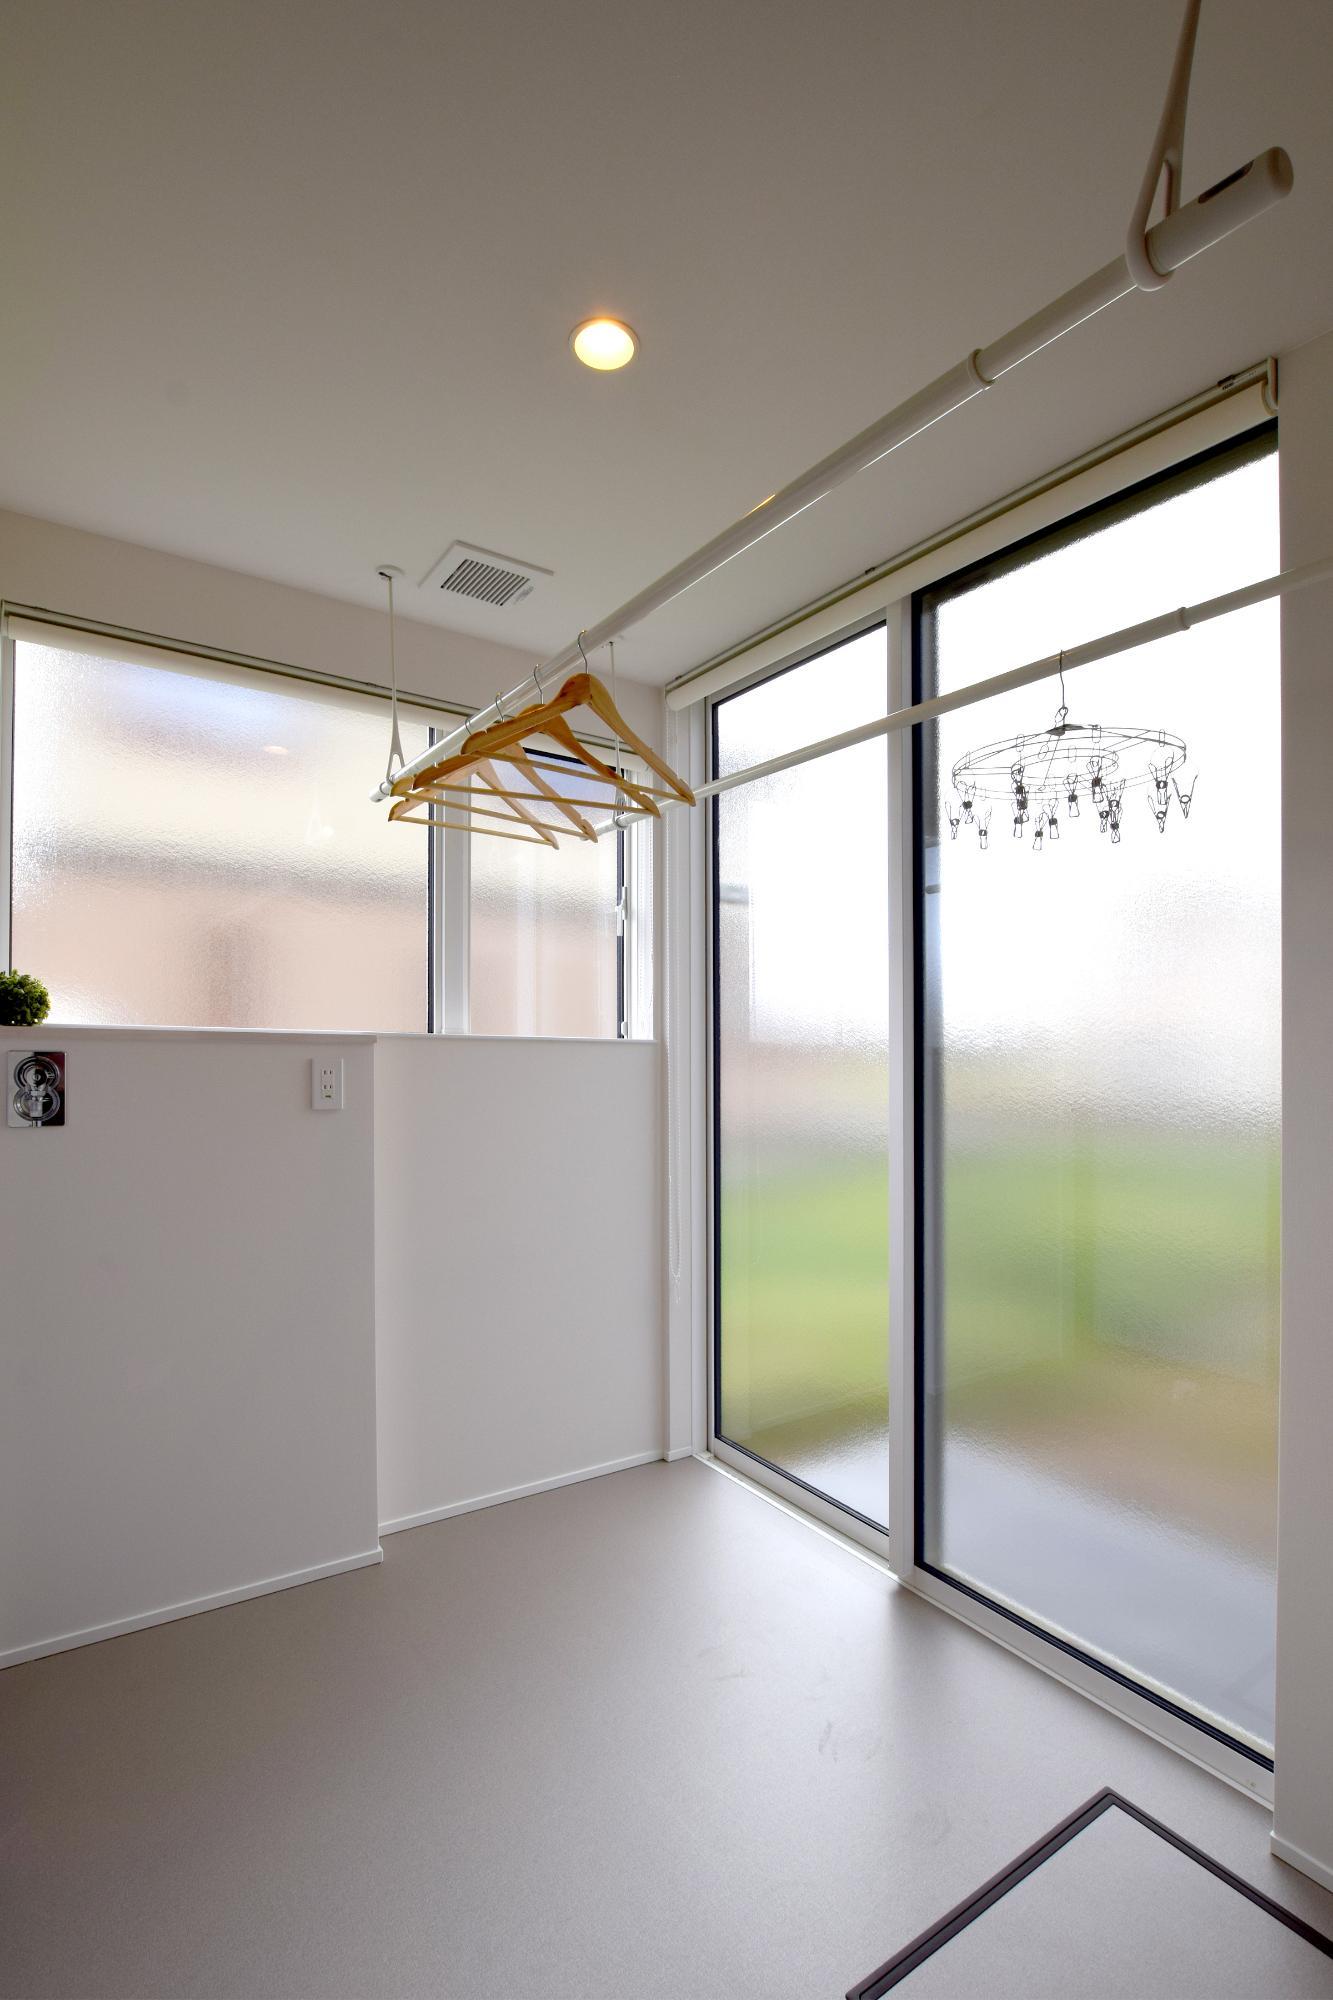 DETAIL HOME(ディテールホーム)「充実収納のスタイリッシュハウス」のモダン・和風・和モダンなundefinedの実例写真